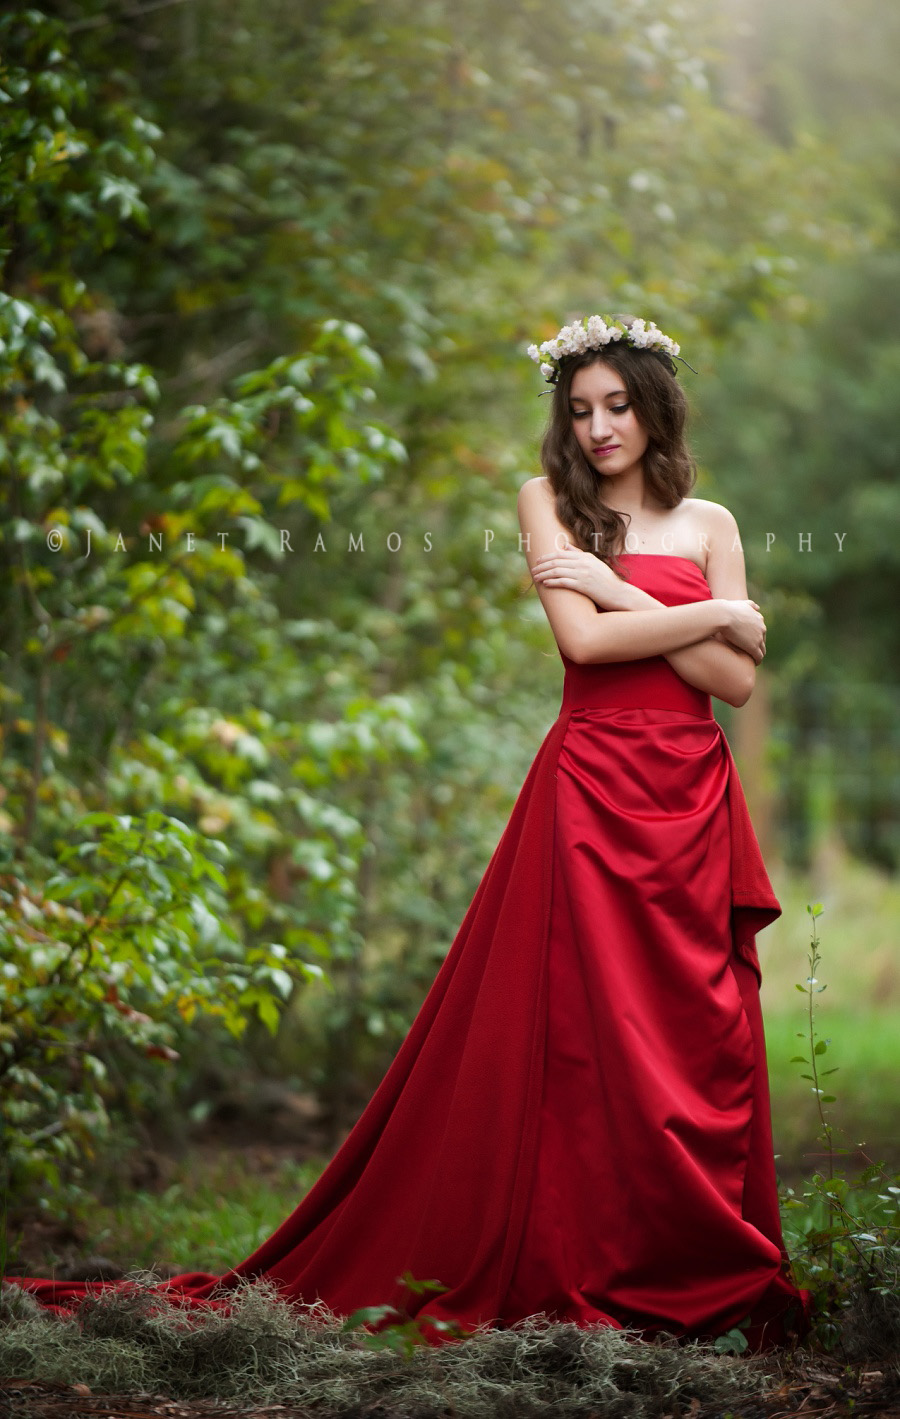 JRPRed_Dress_0217.jpg